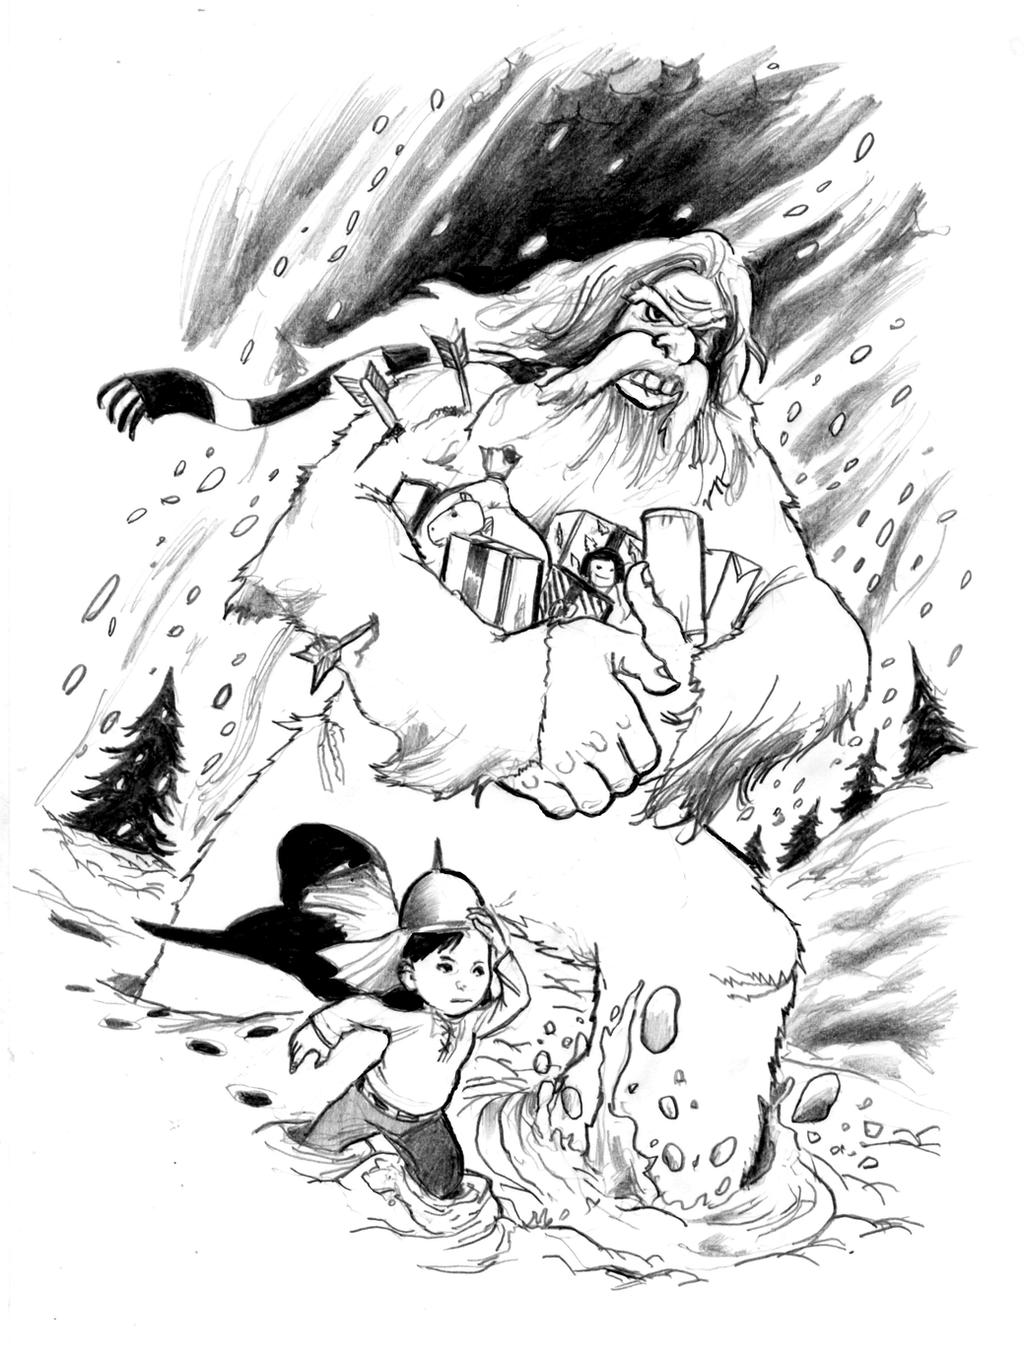 A Christmas Yeti By Cluedog On DeviantArt